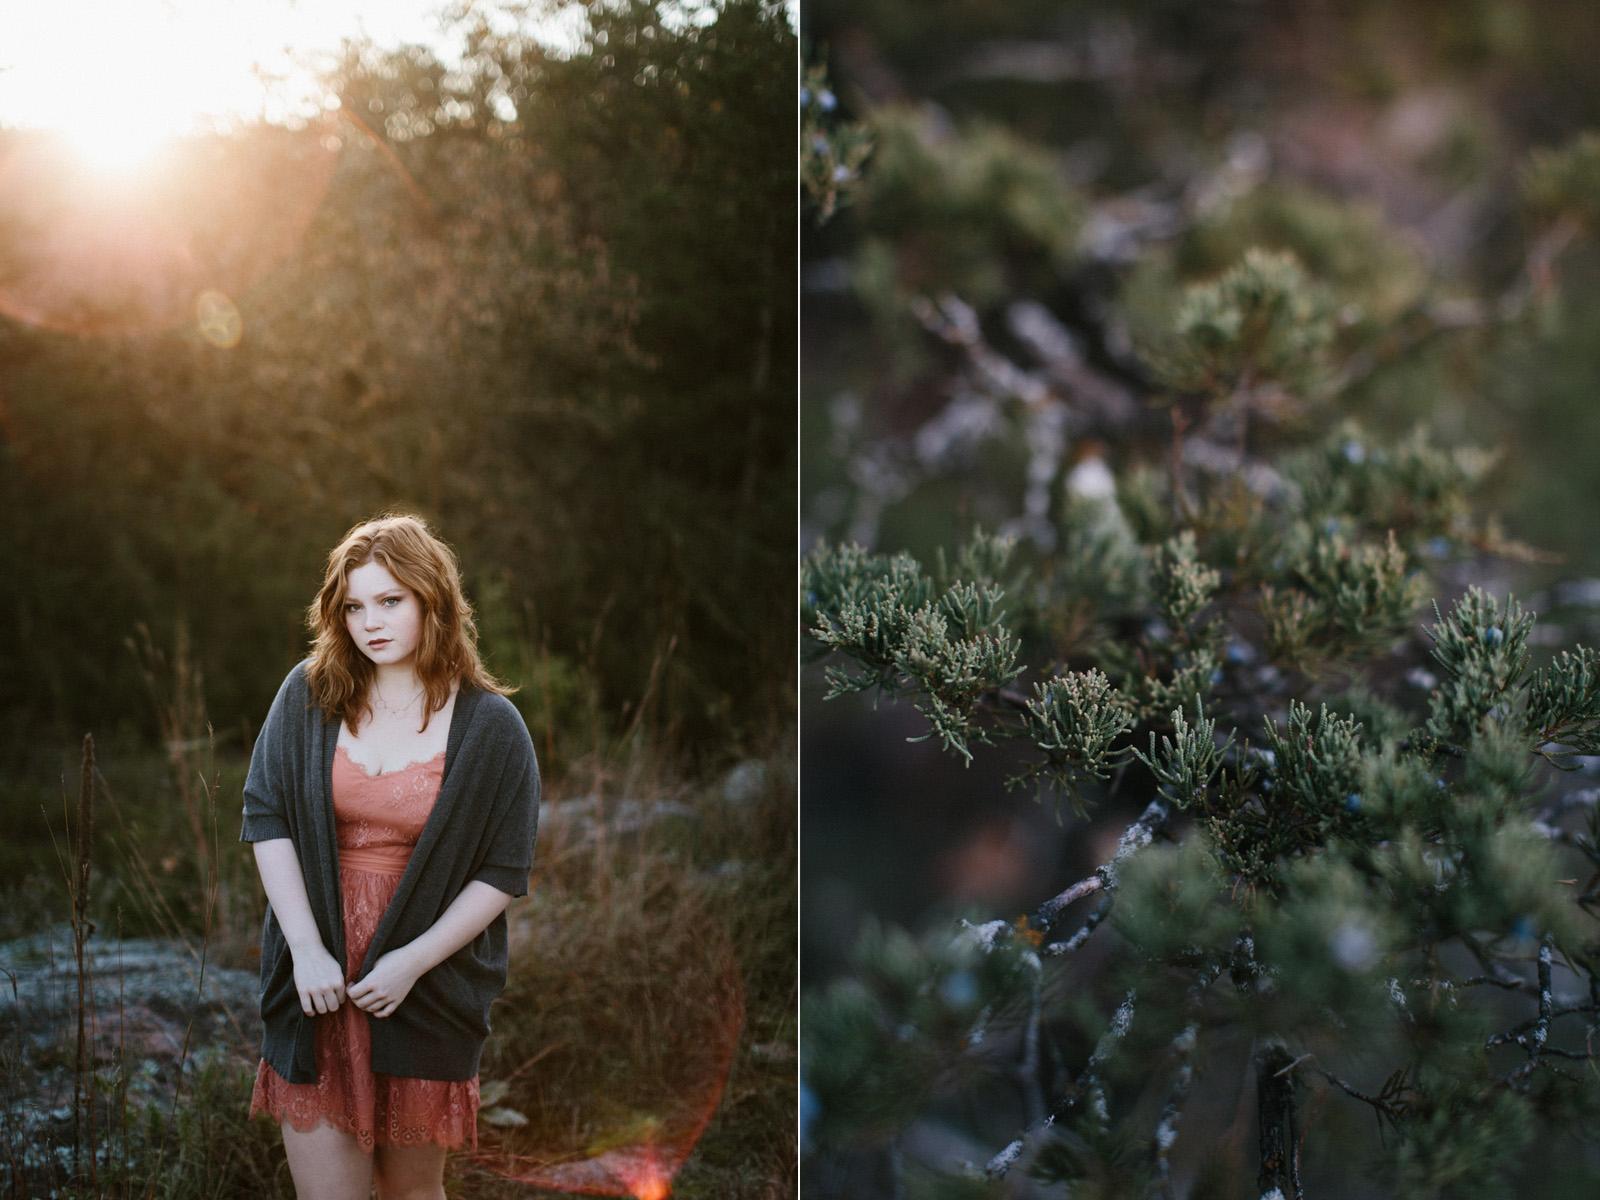 Sioux_Falls_Portrait_Photography_09.jpg